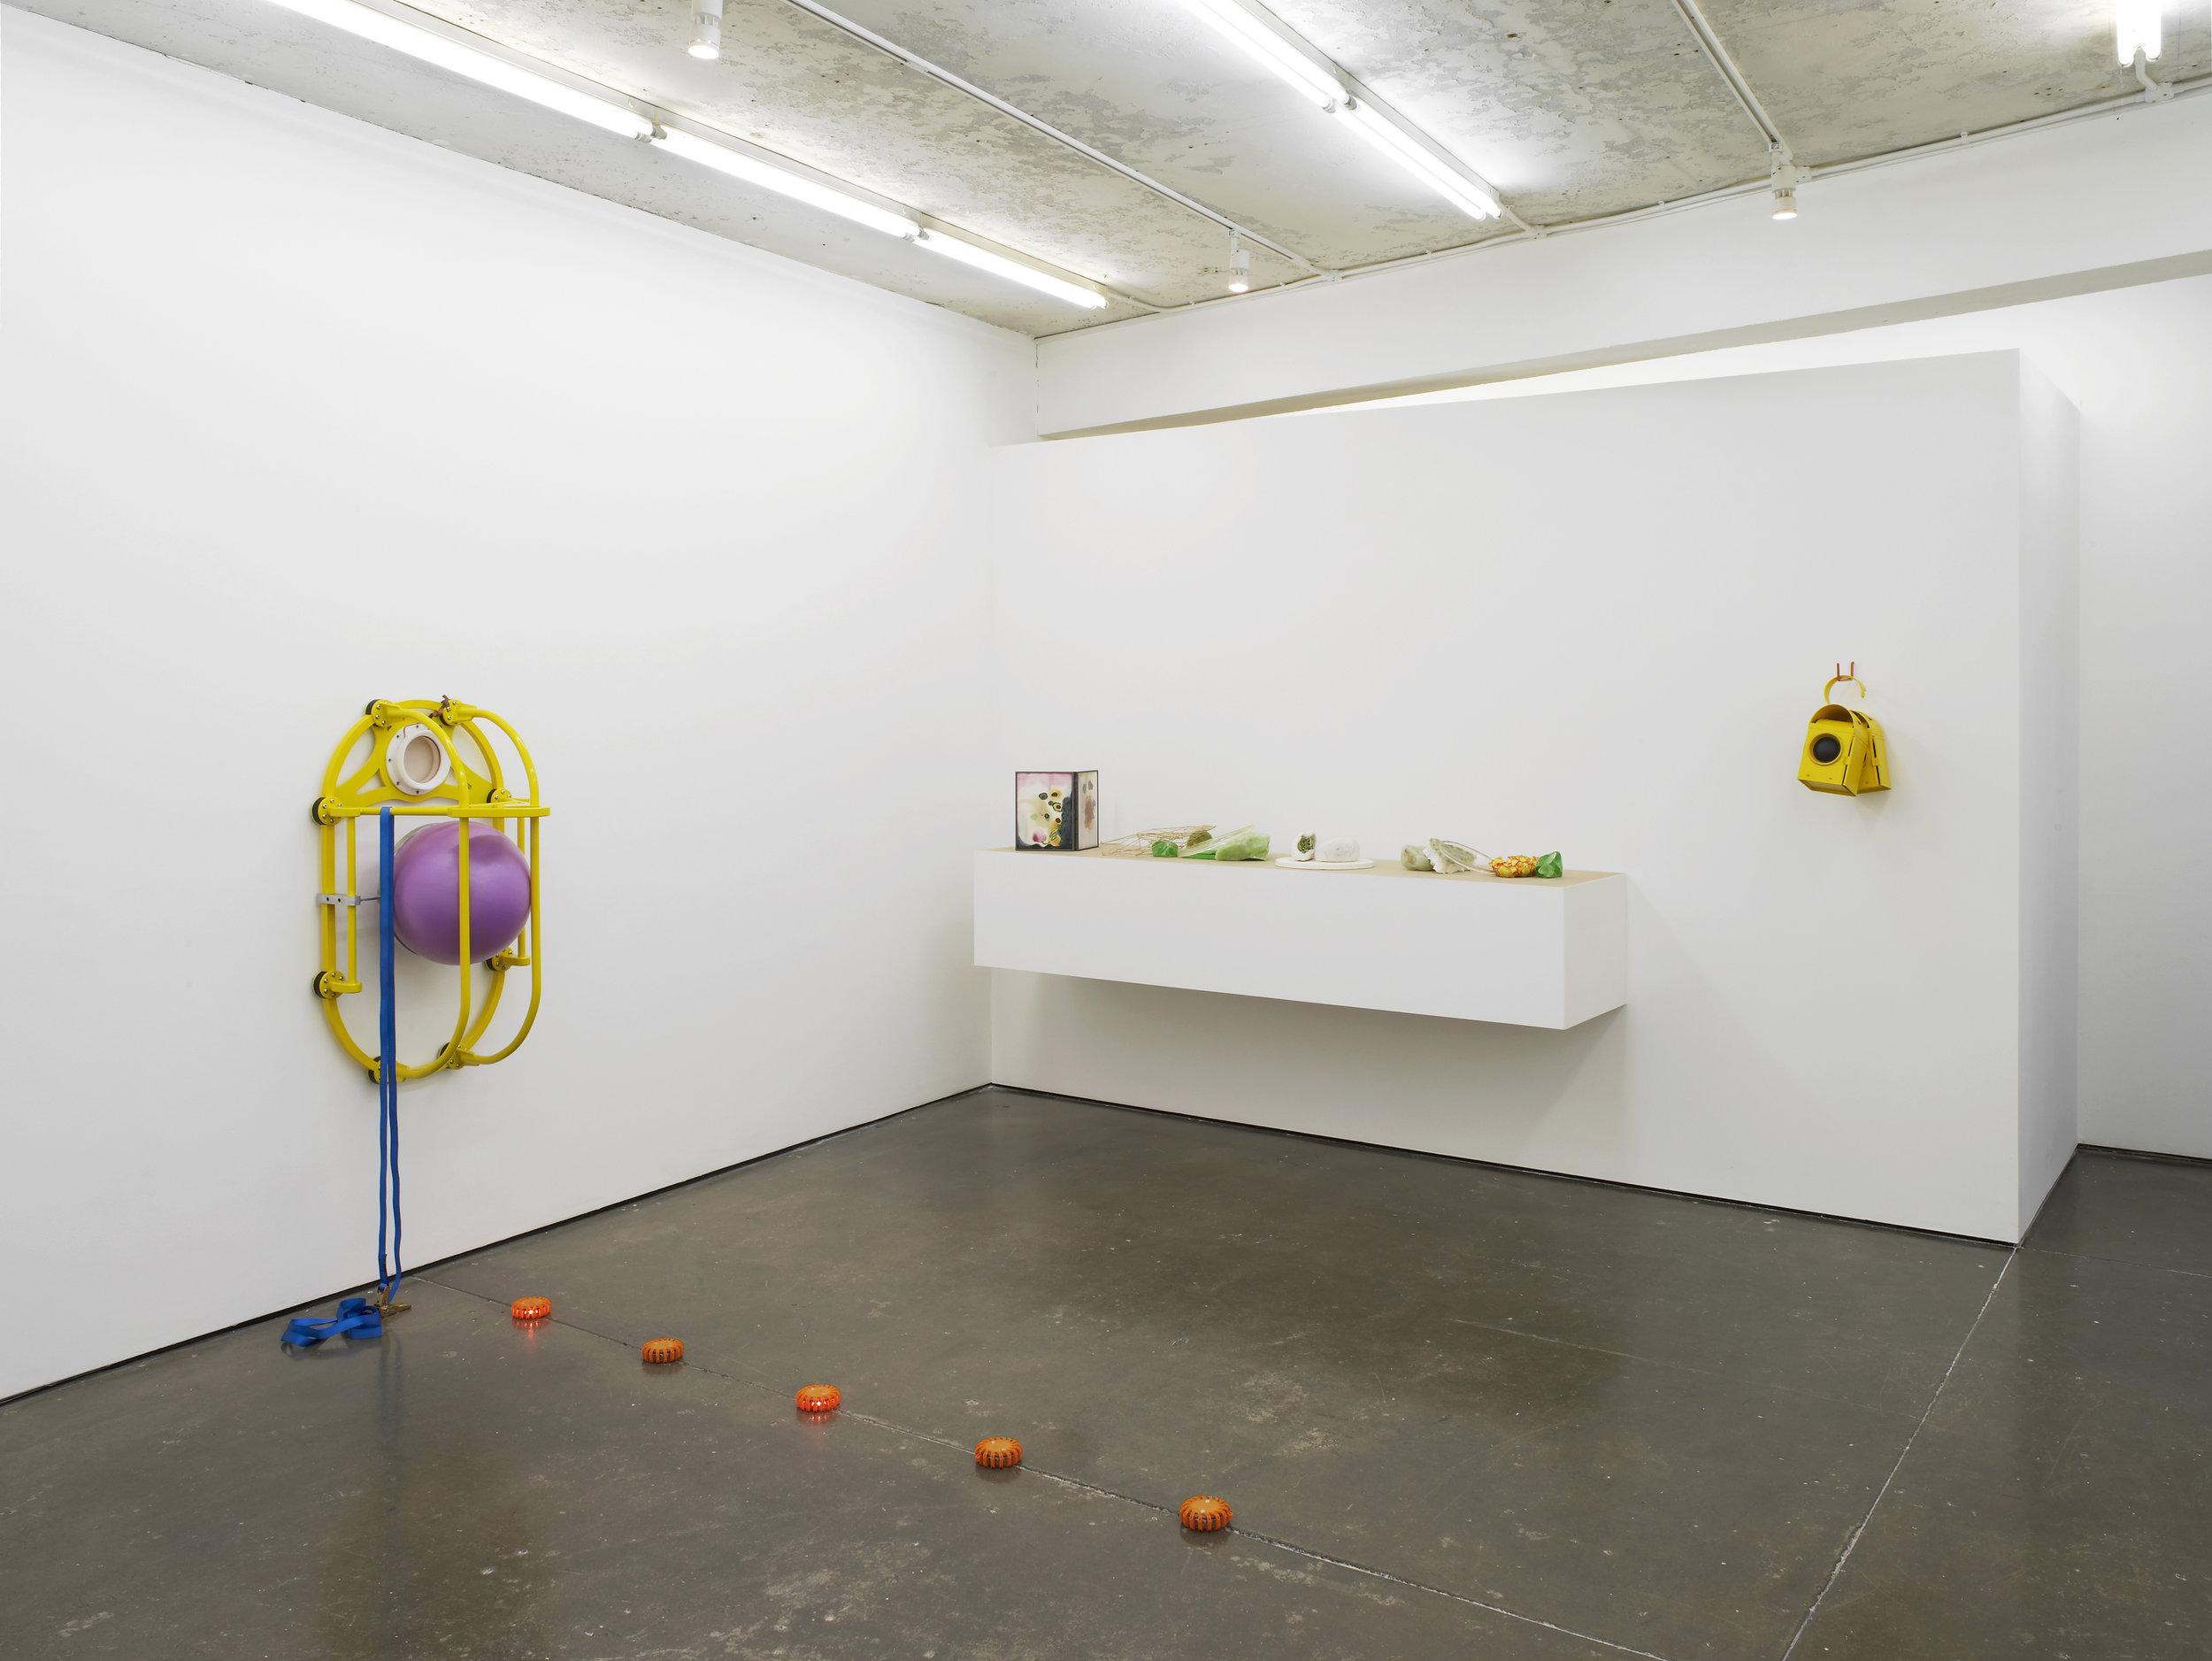 Christina Mackie  Drift Rust  Installation View  Herald St  2017